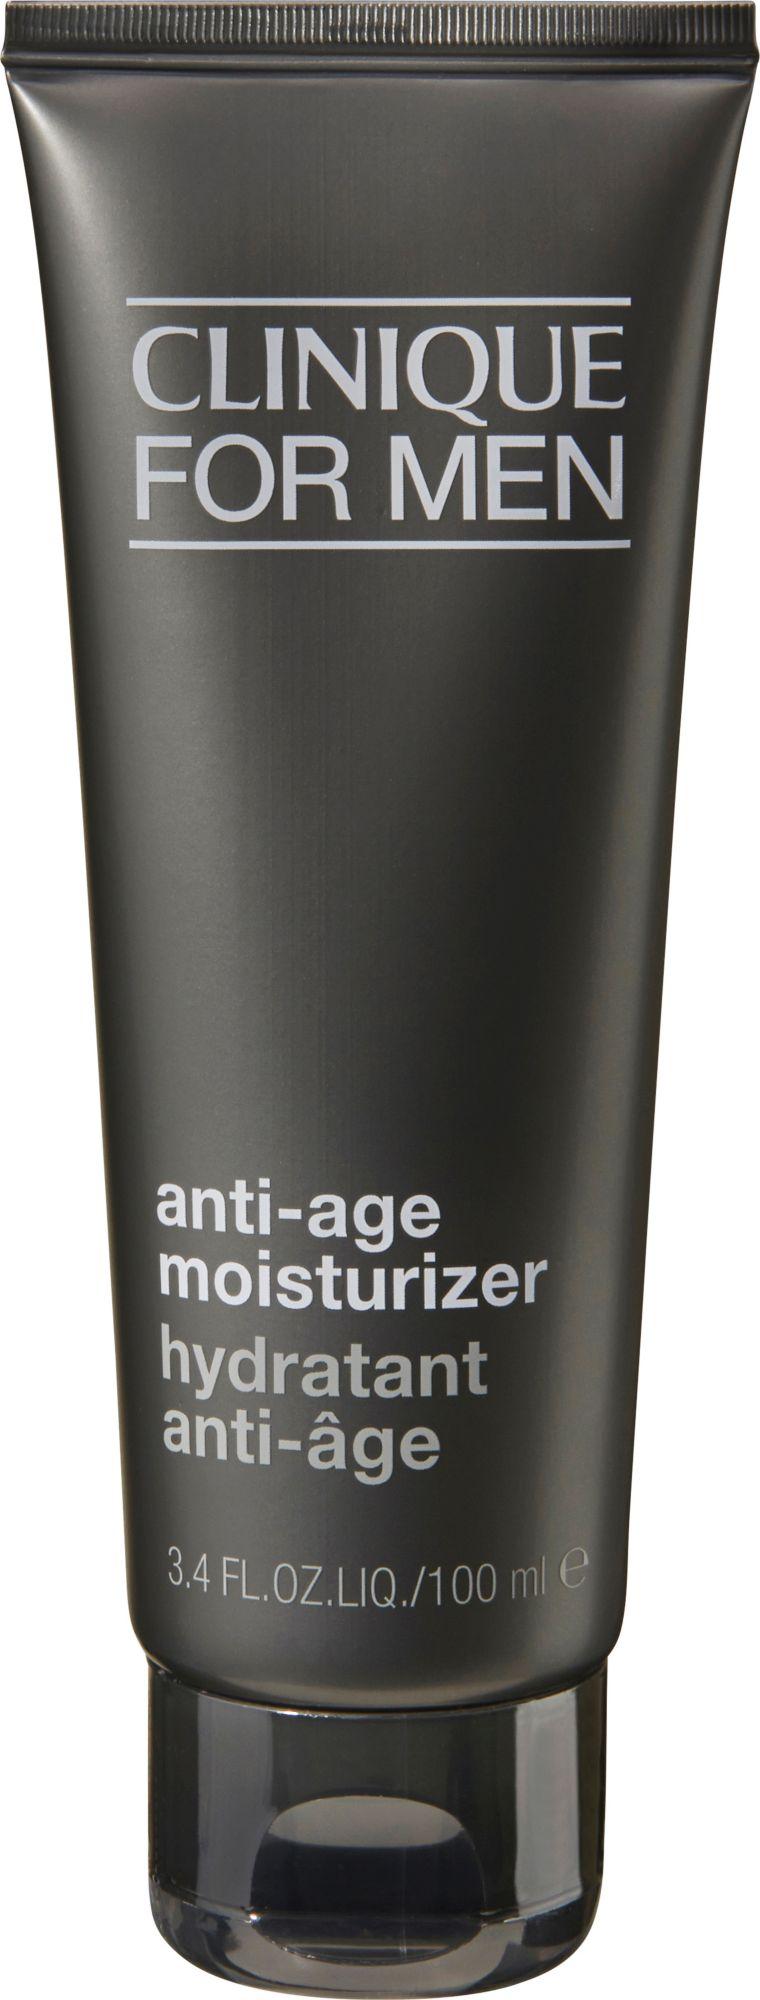 CLINIQUE Clinique, »Anti-Age Moisturizer«, Anti-Aging Feuchtigkeitspflege